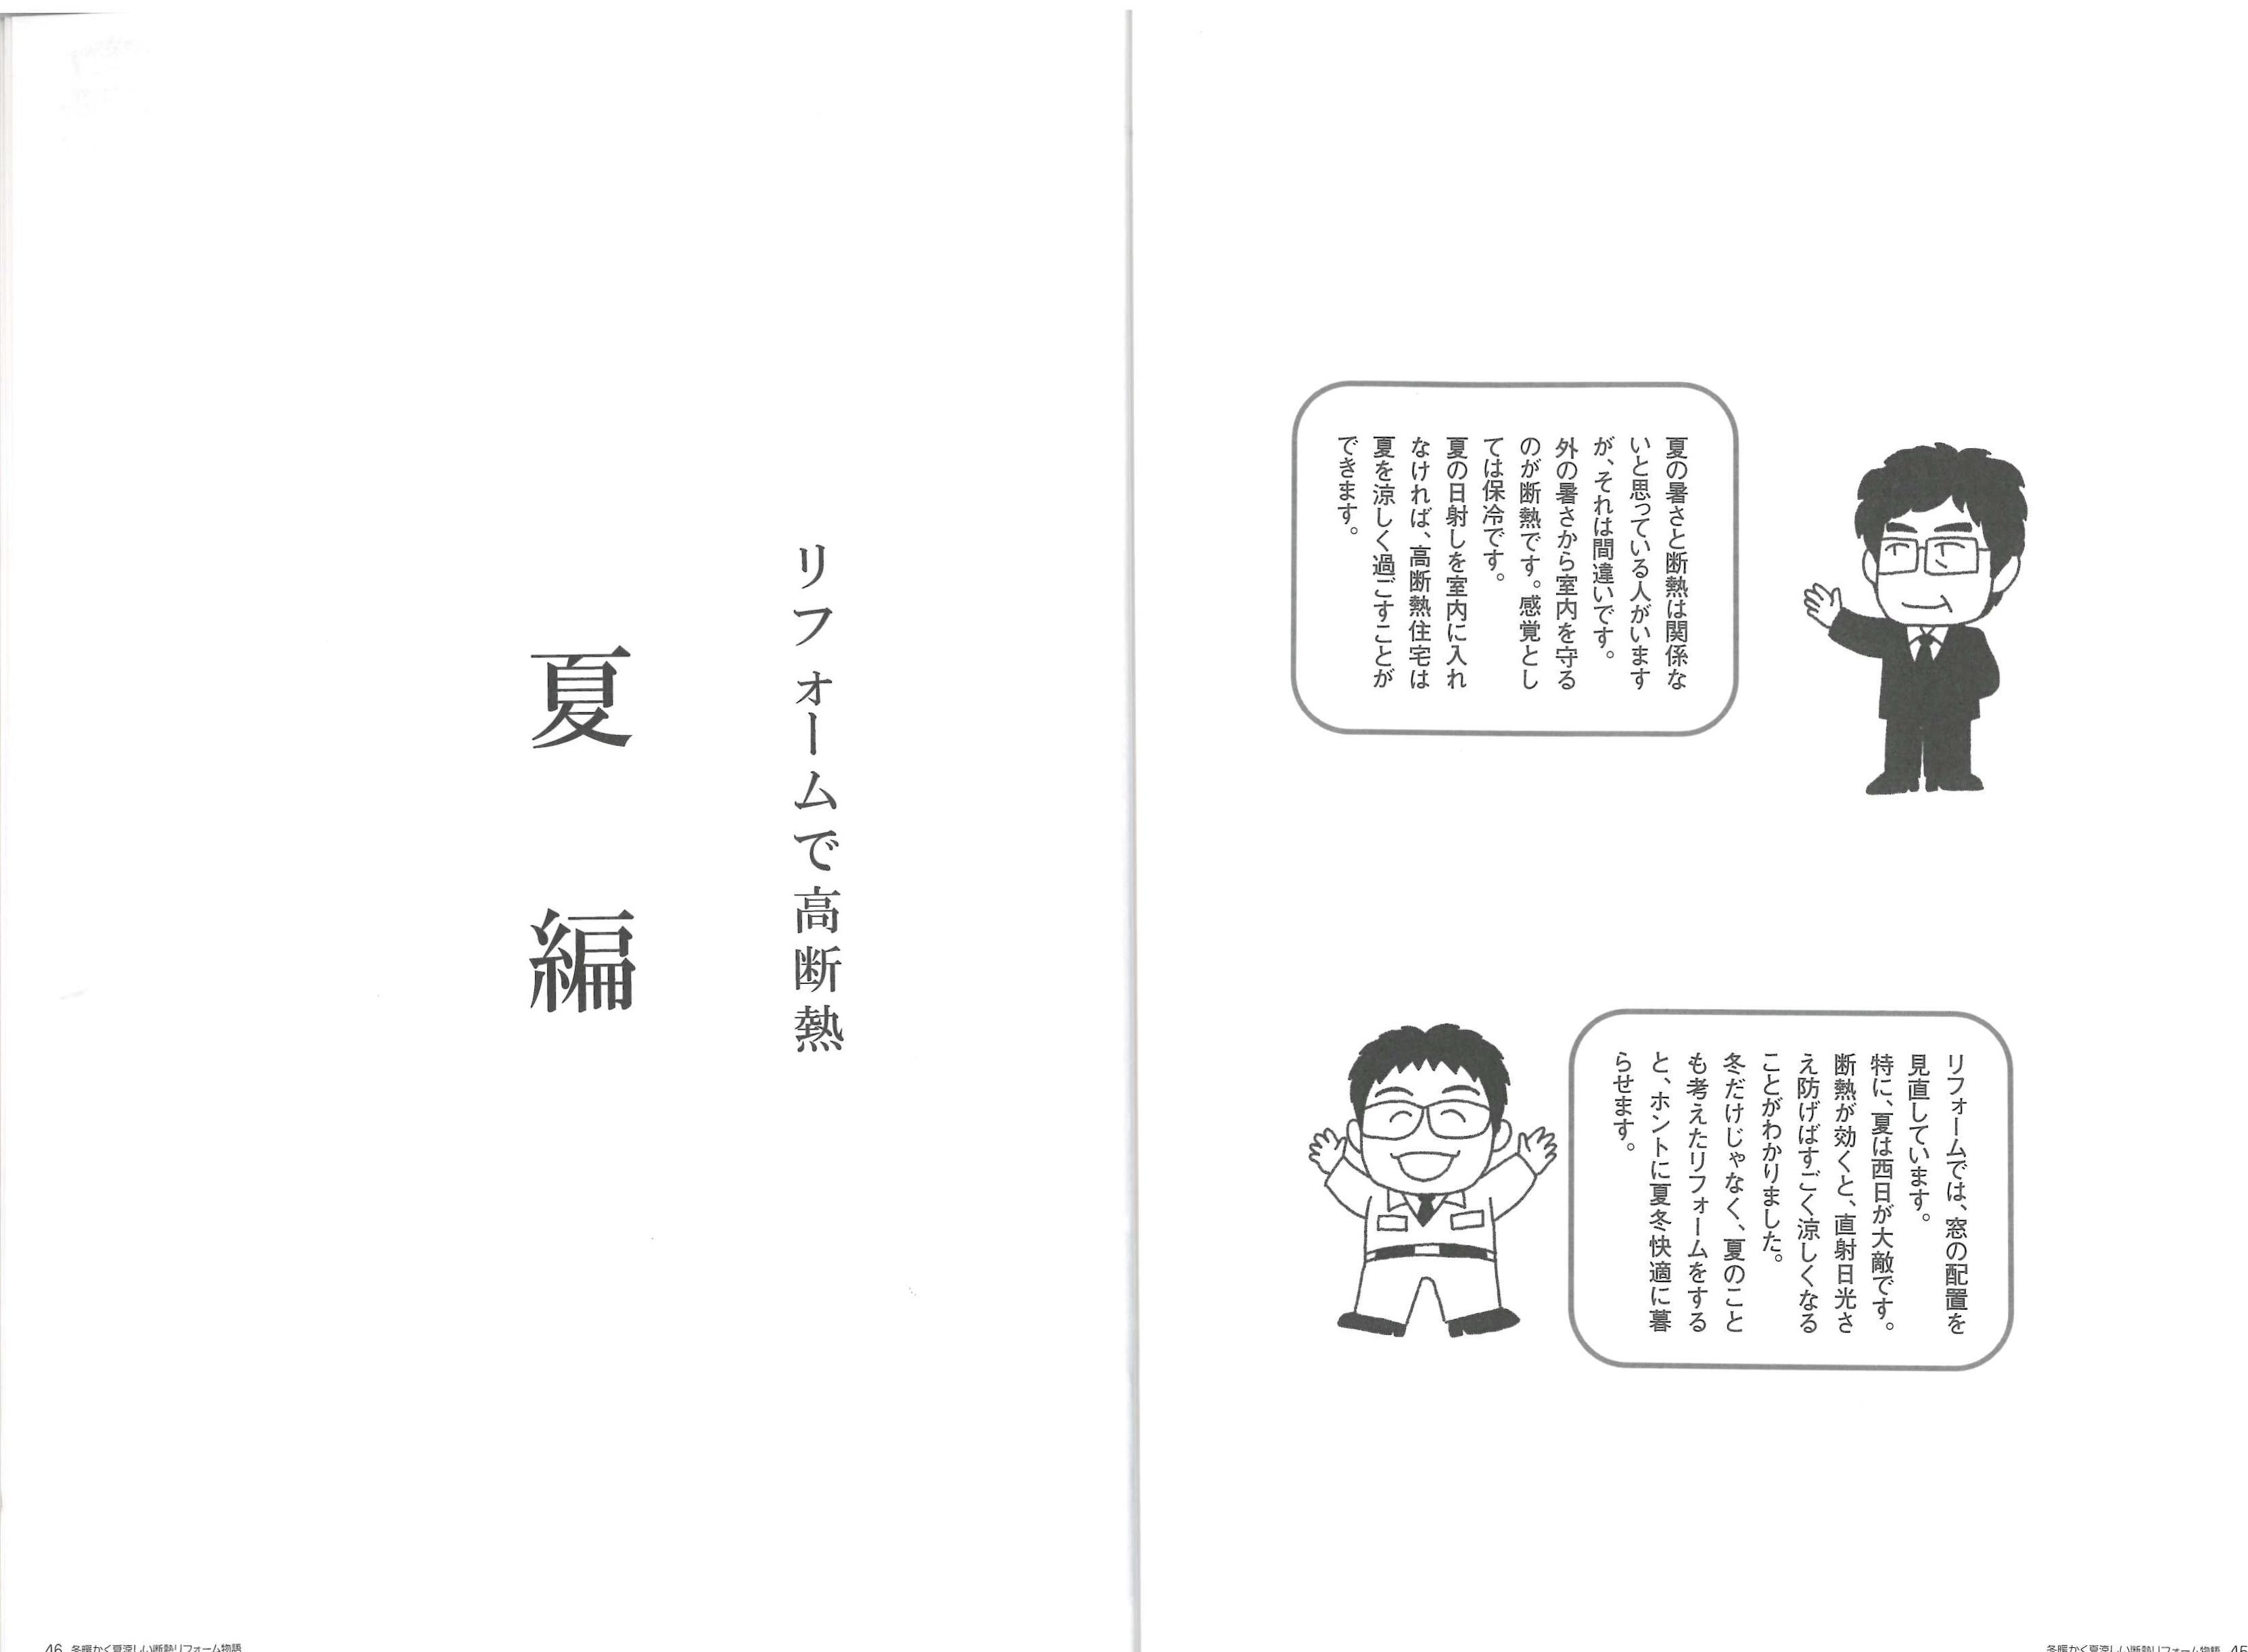 新住協マンガ本西日本版夏編の写真